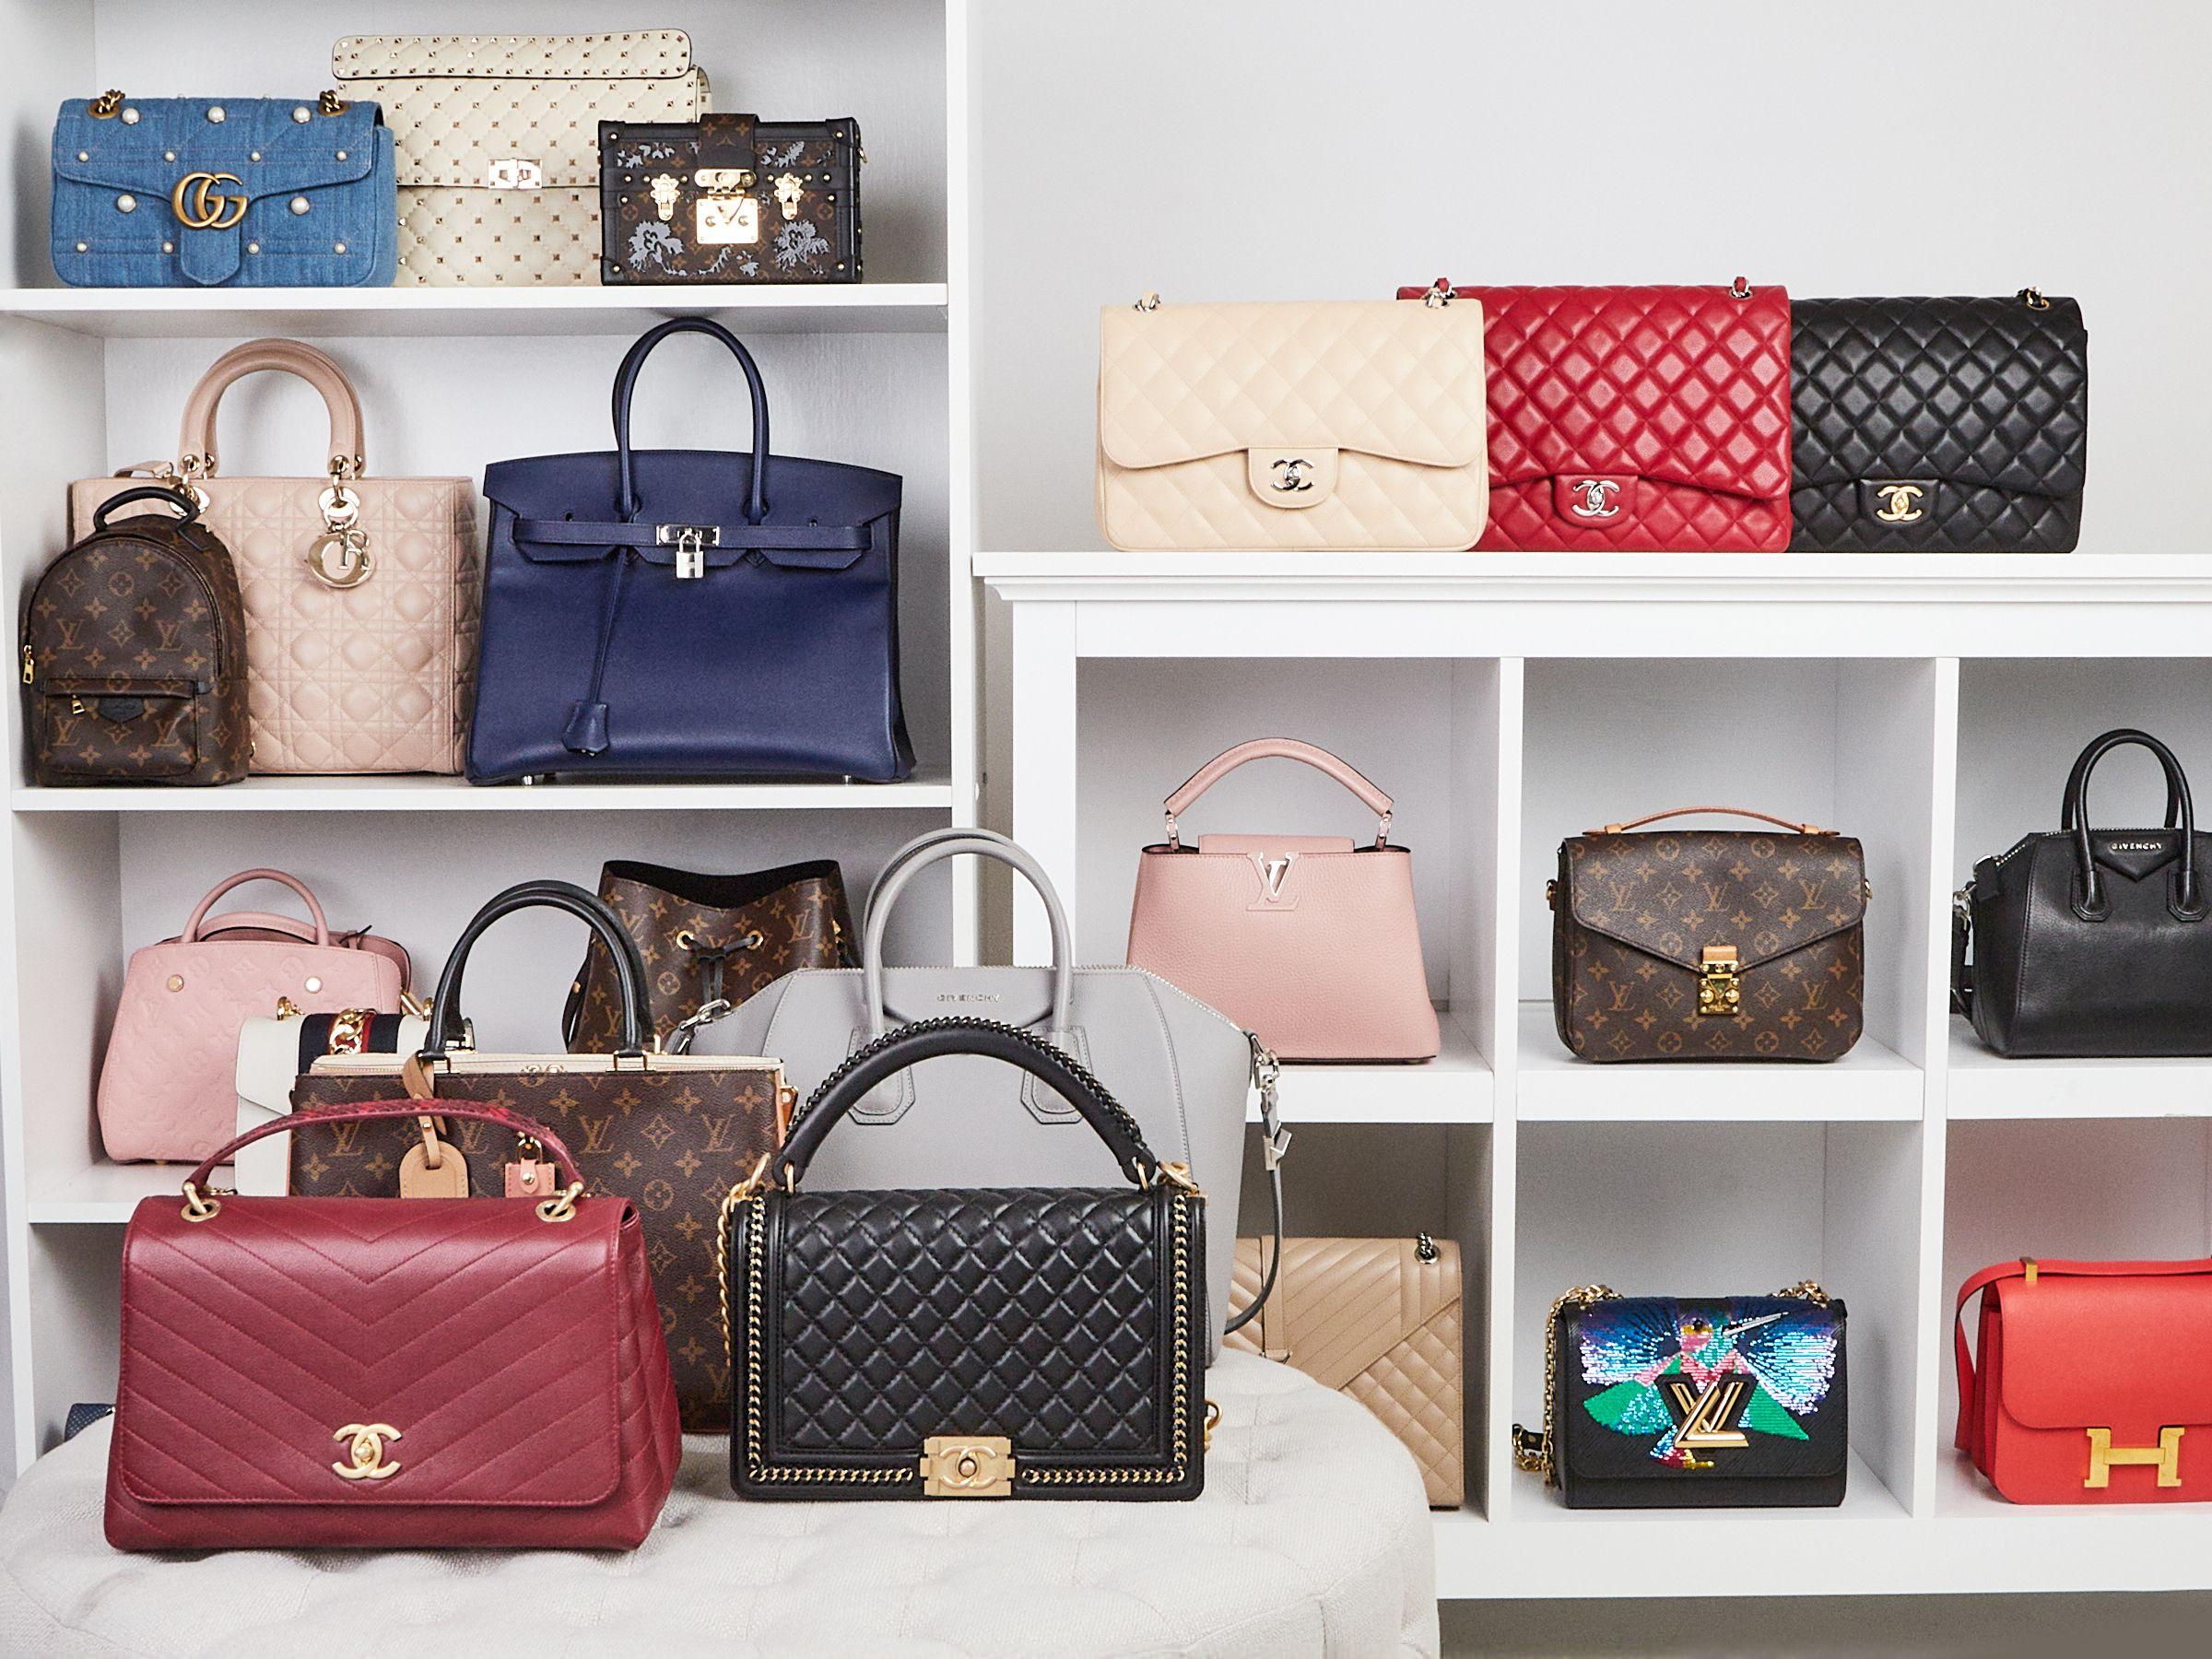 44 Most Por Designer Handbags Of